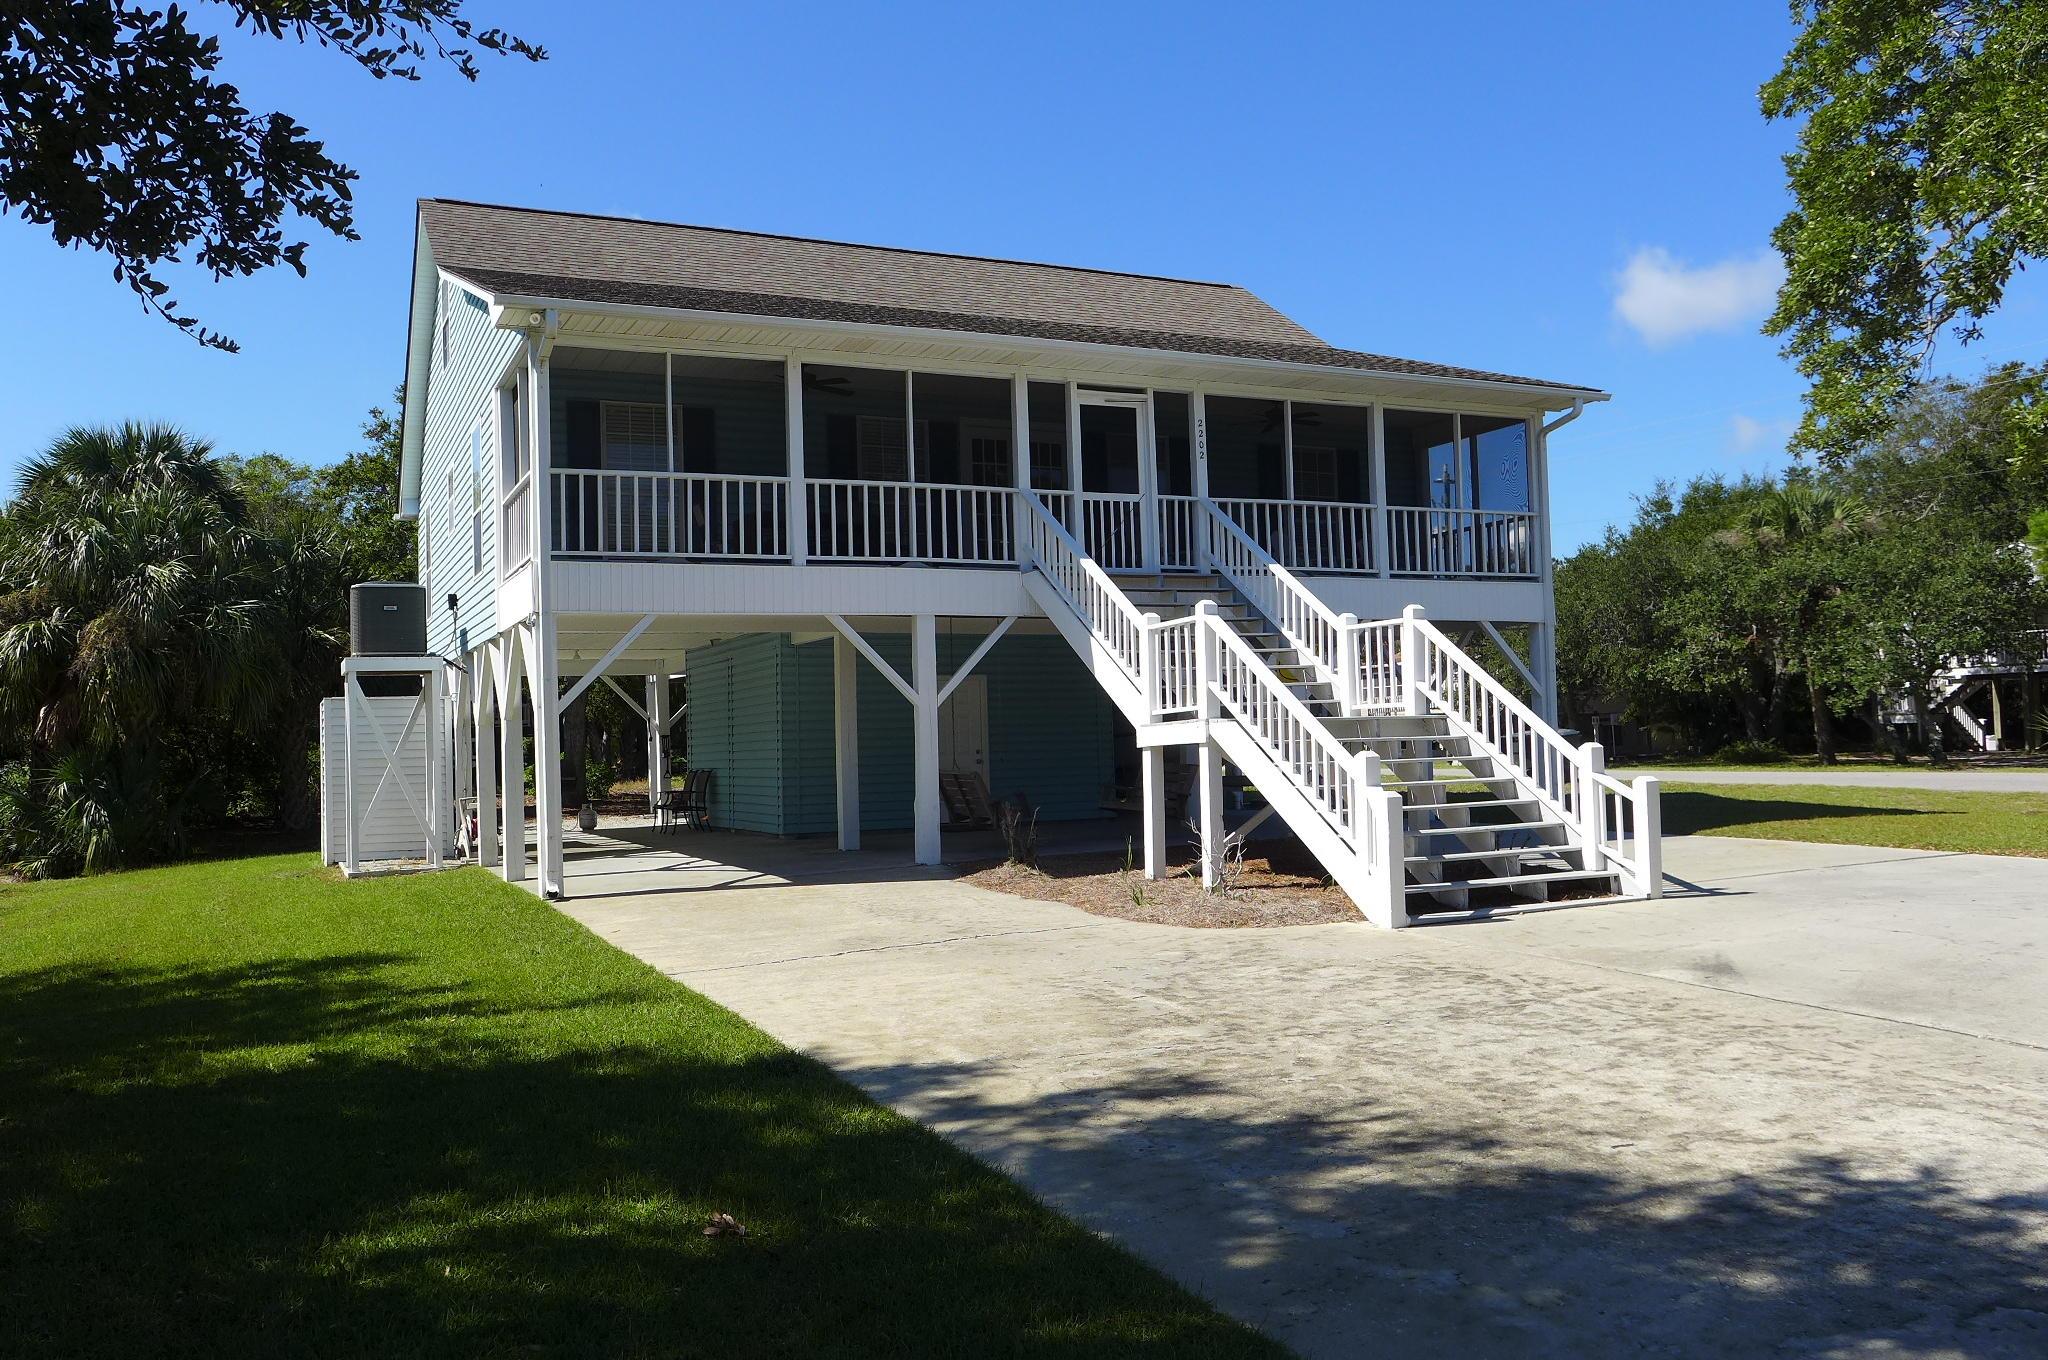 Edisto Beach Homes For Sale - 2202 Myrtle, Edisto Beach, SC - 27